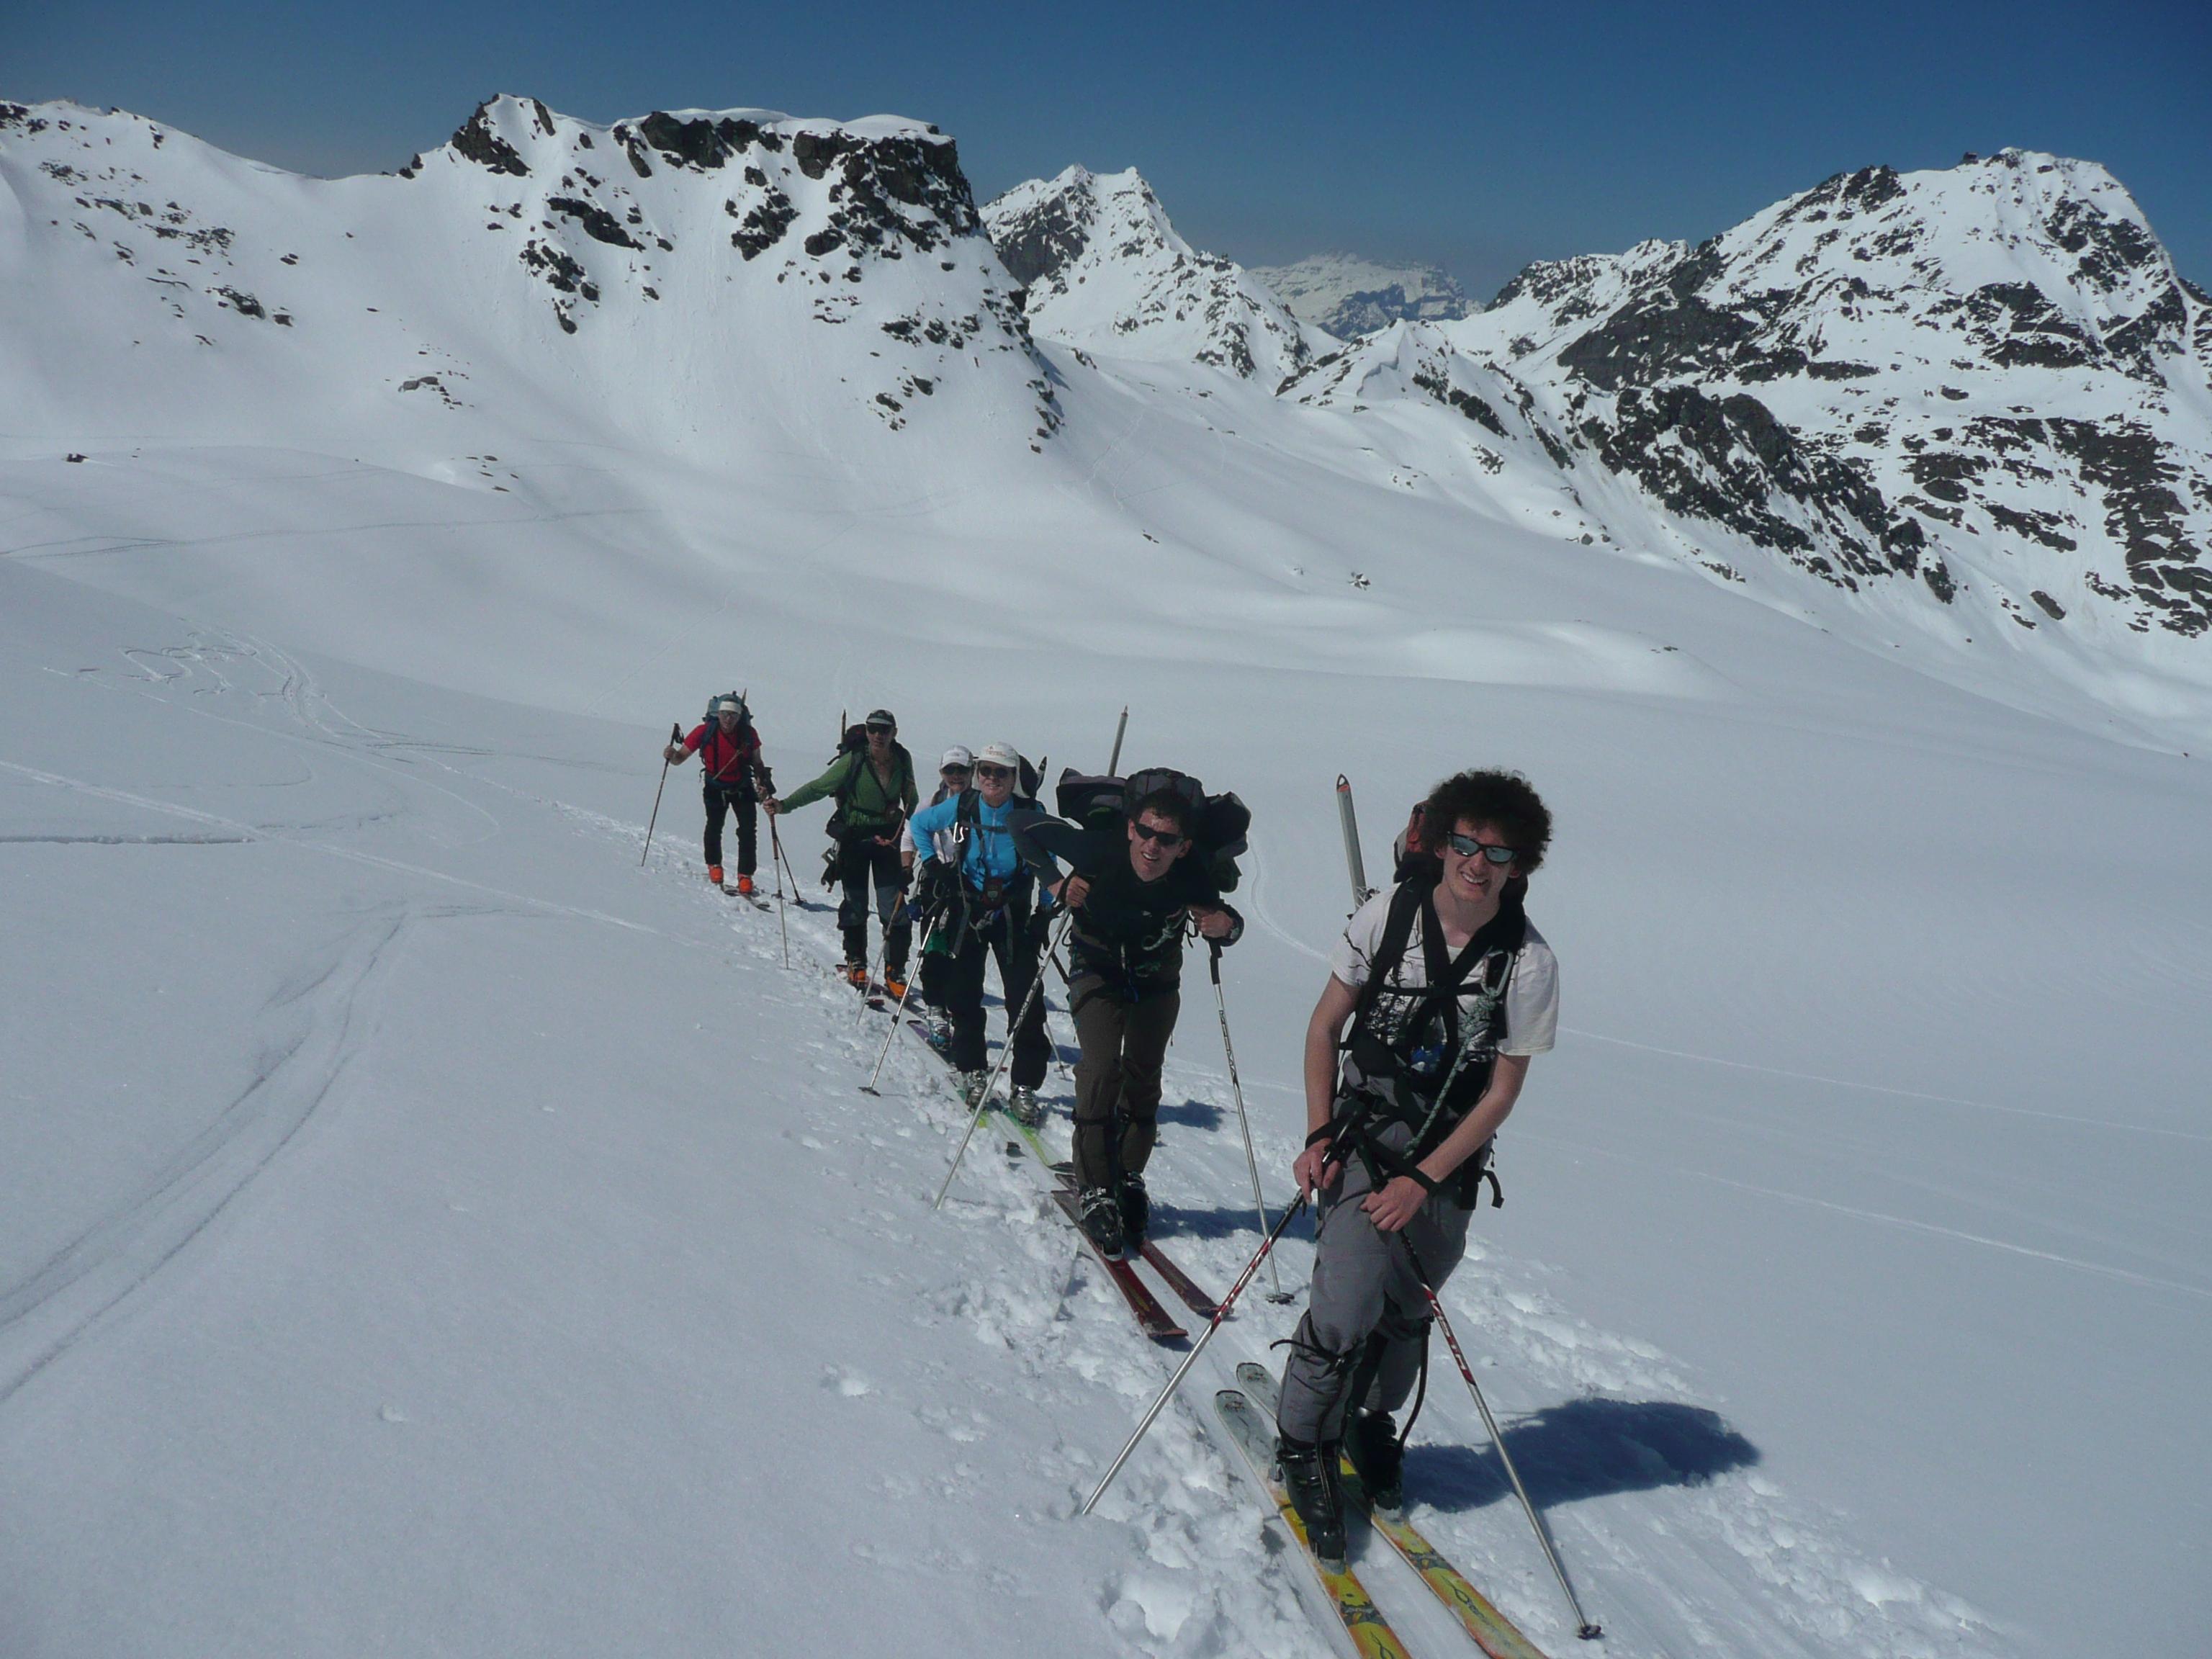 Alpaventure chamonix zermatt haute route for Haute route chamonix zermatt